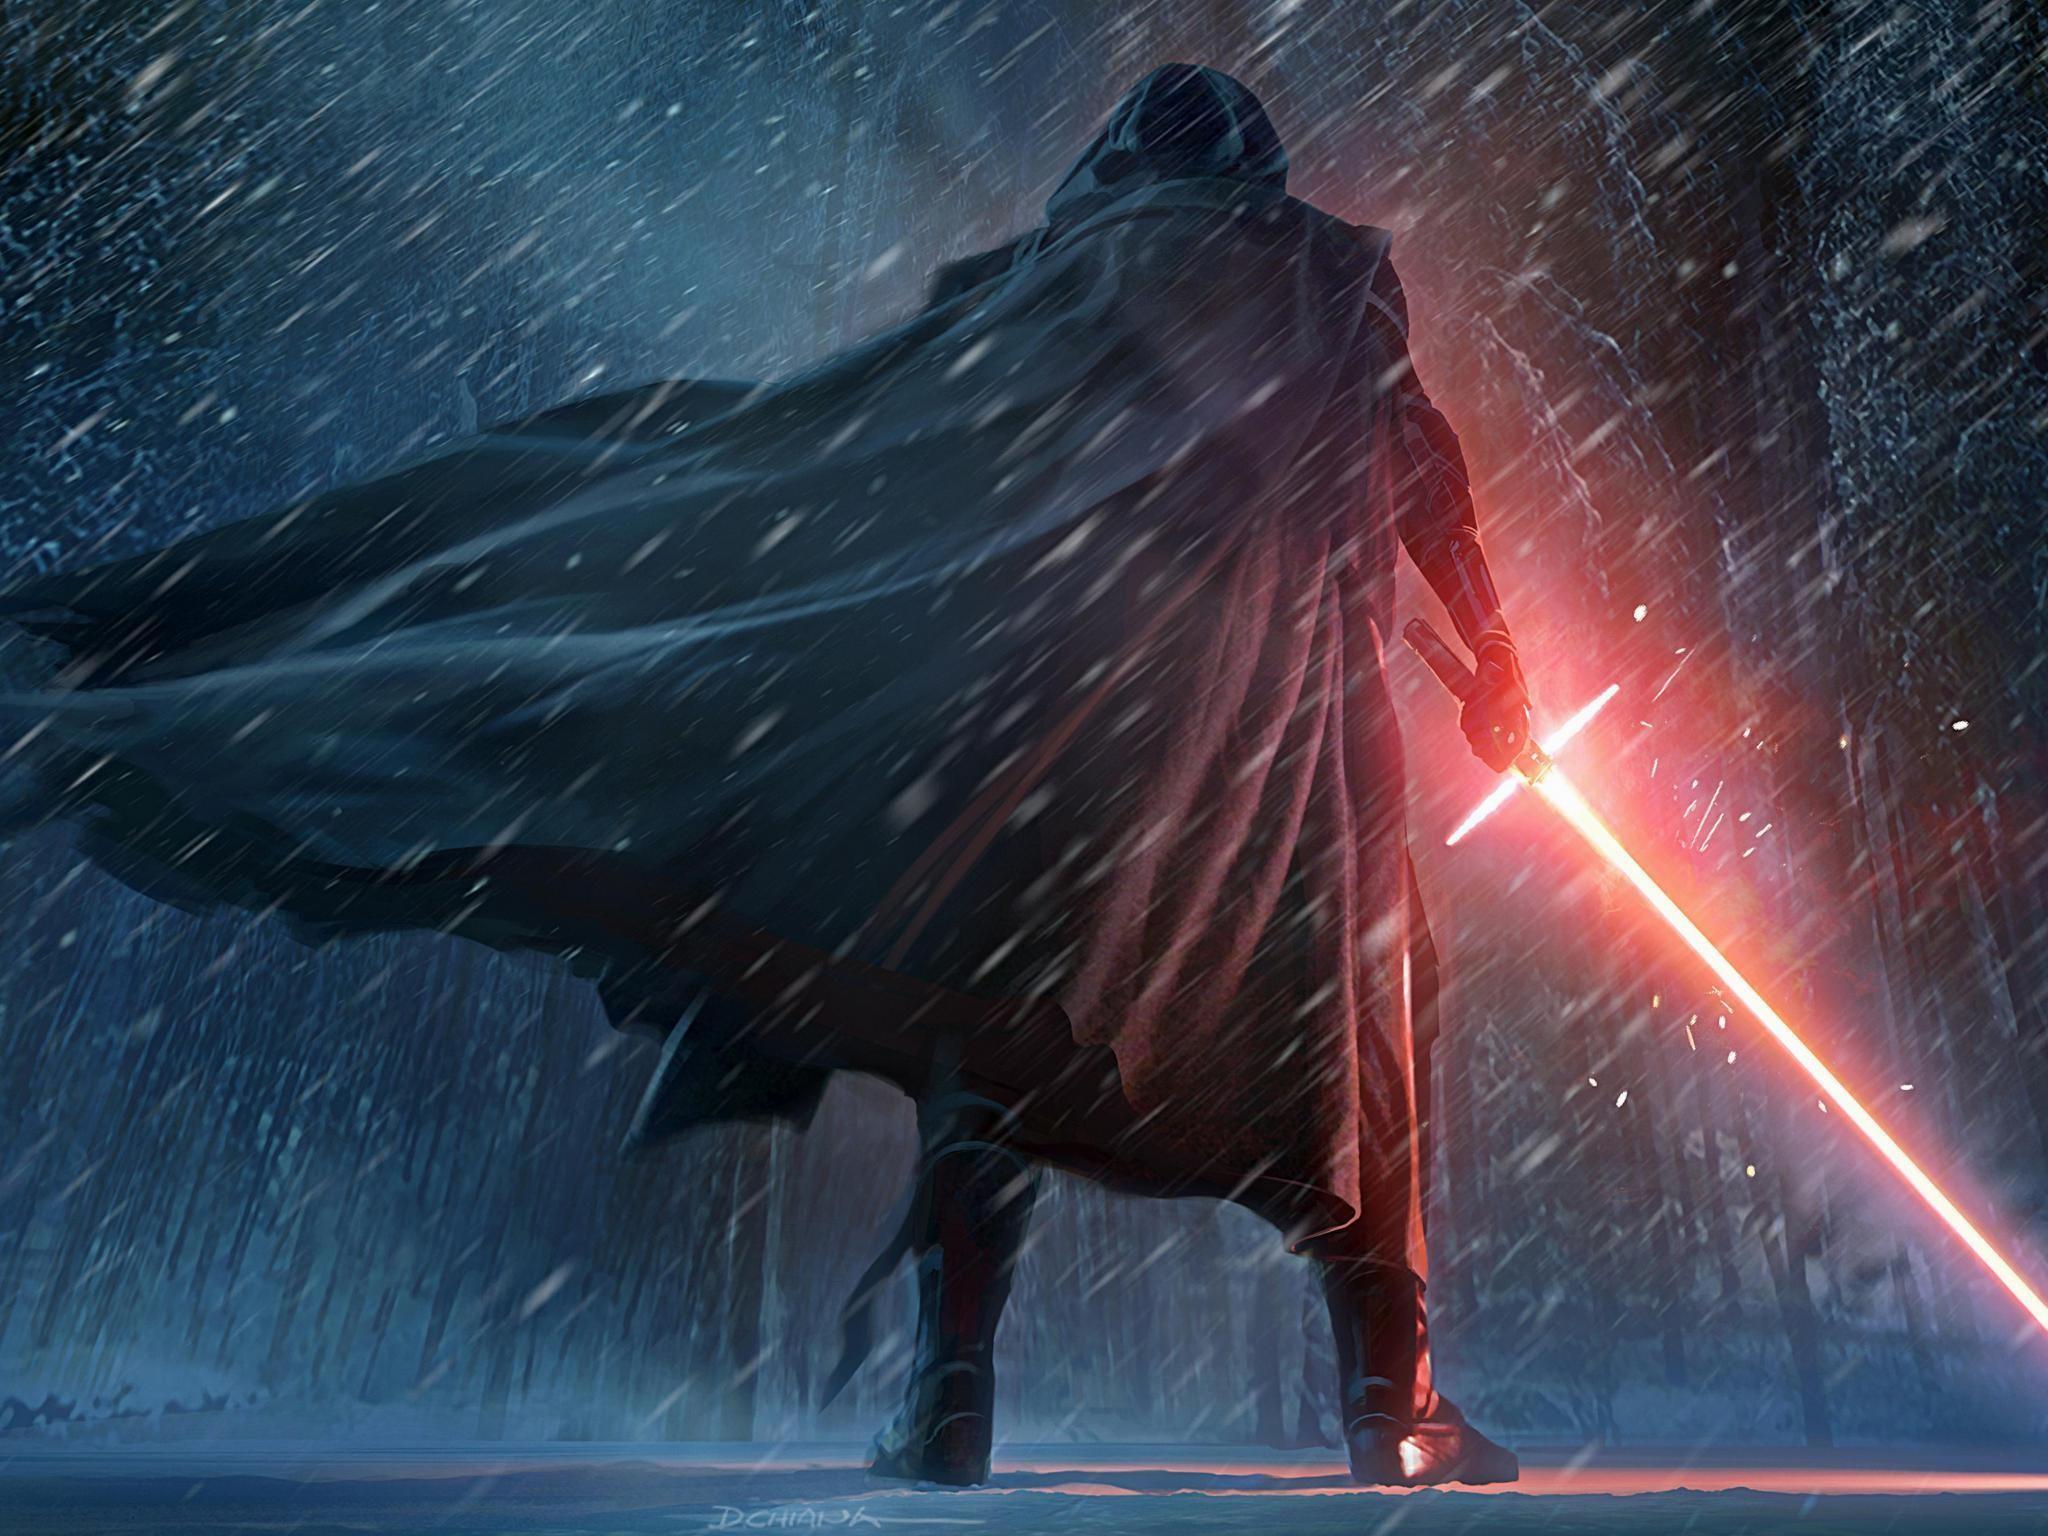 wallpaper.wiki-Star-Wars-The-Force-Awakens-Background-